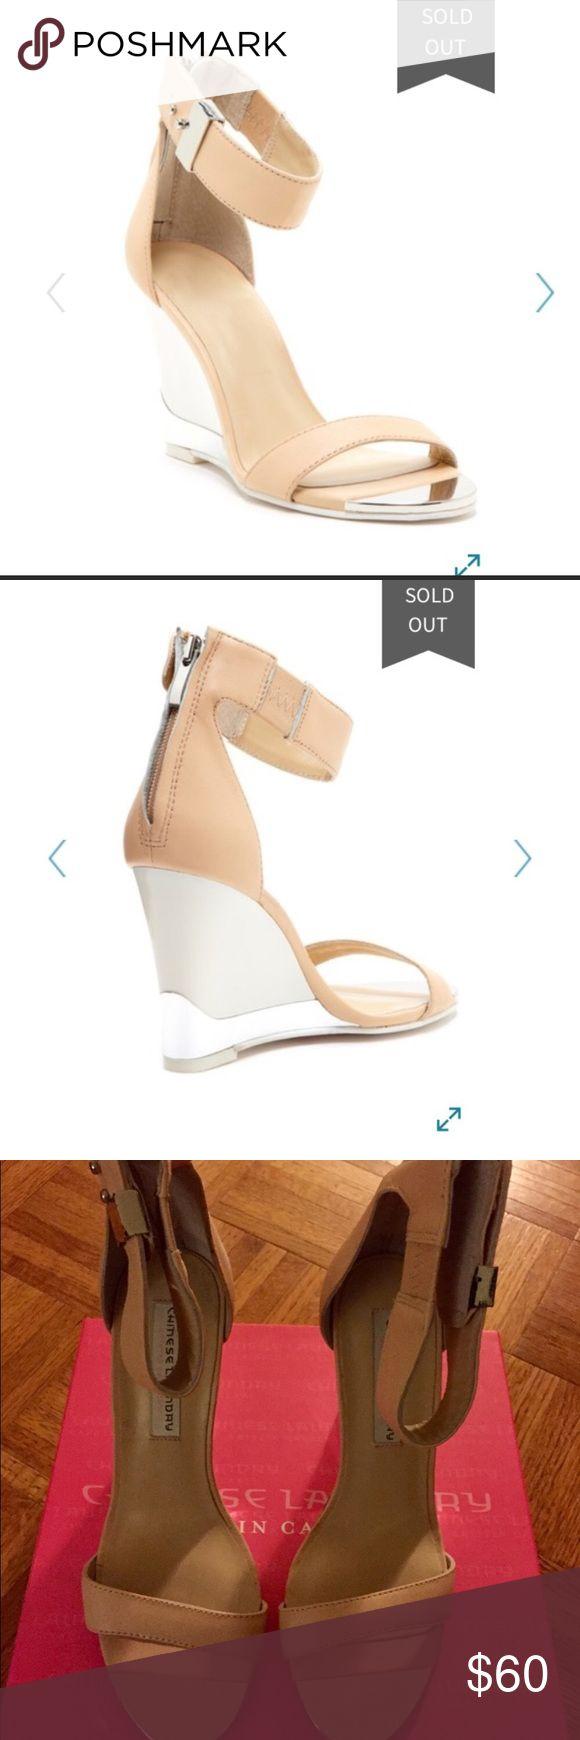 NWB Kristin Cavallari Nude Wedge Sandals Brand new - Chinese Laundry Kristin Cavallari sandals. Run 1/2 size small Chinese Laundry Shoes Sandals